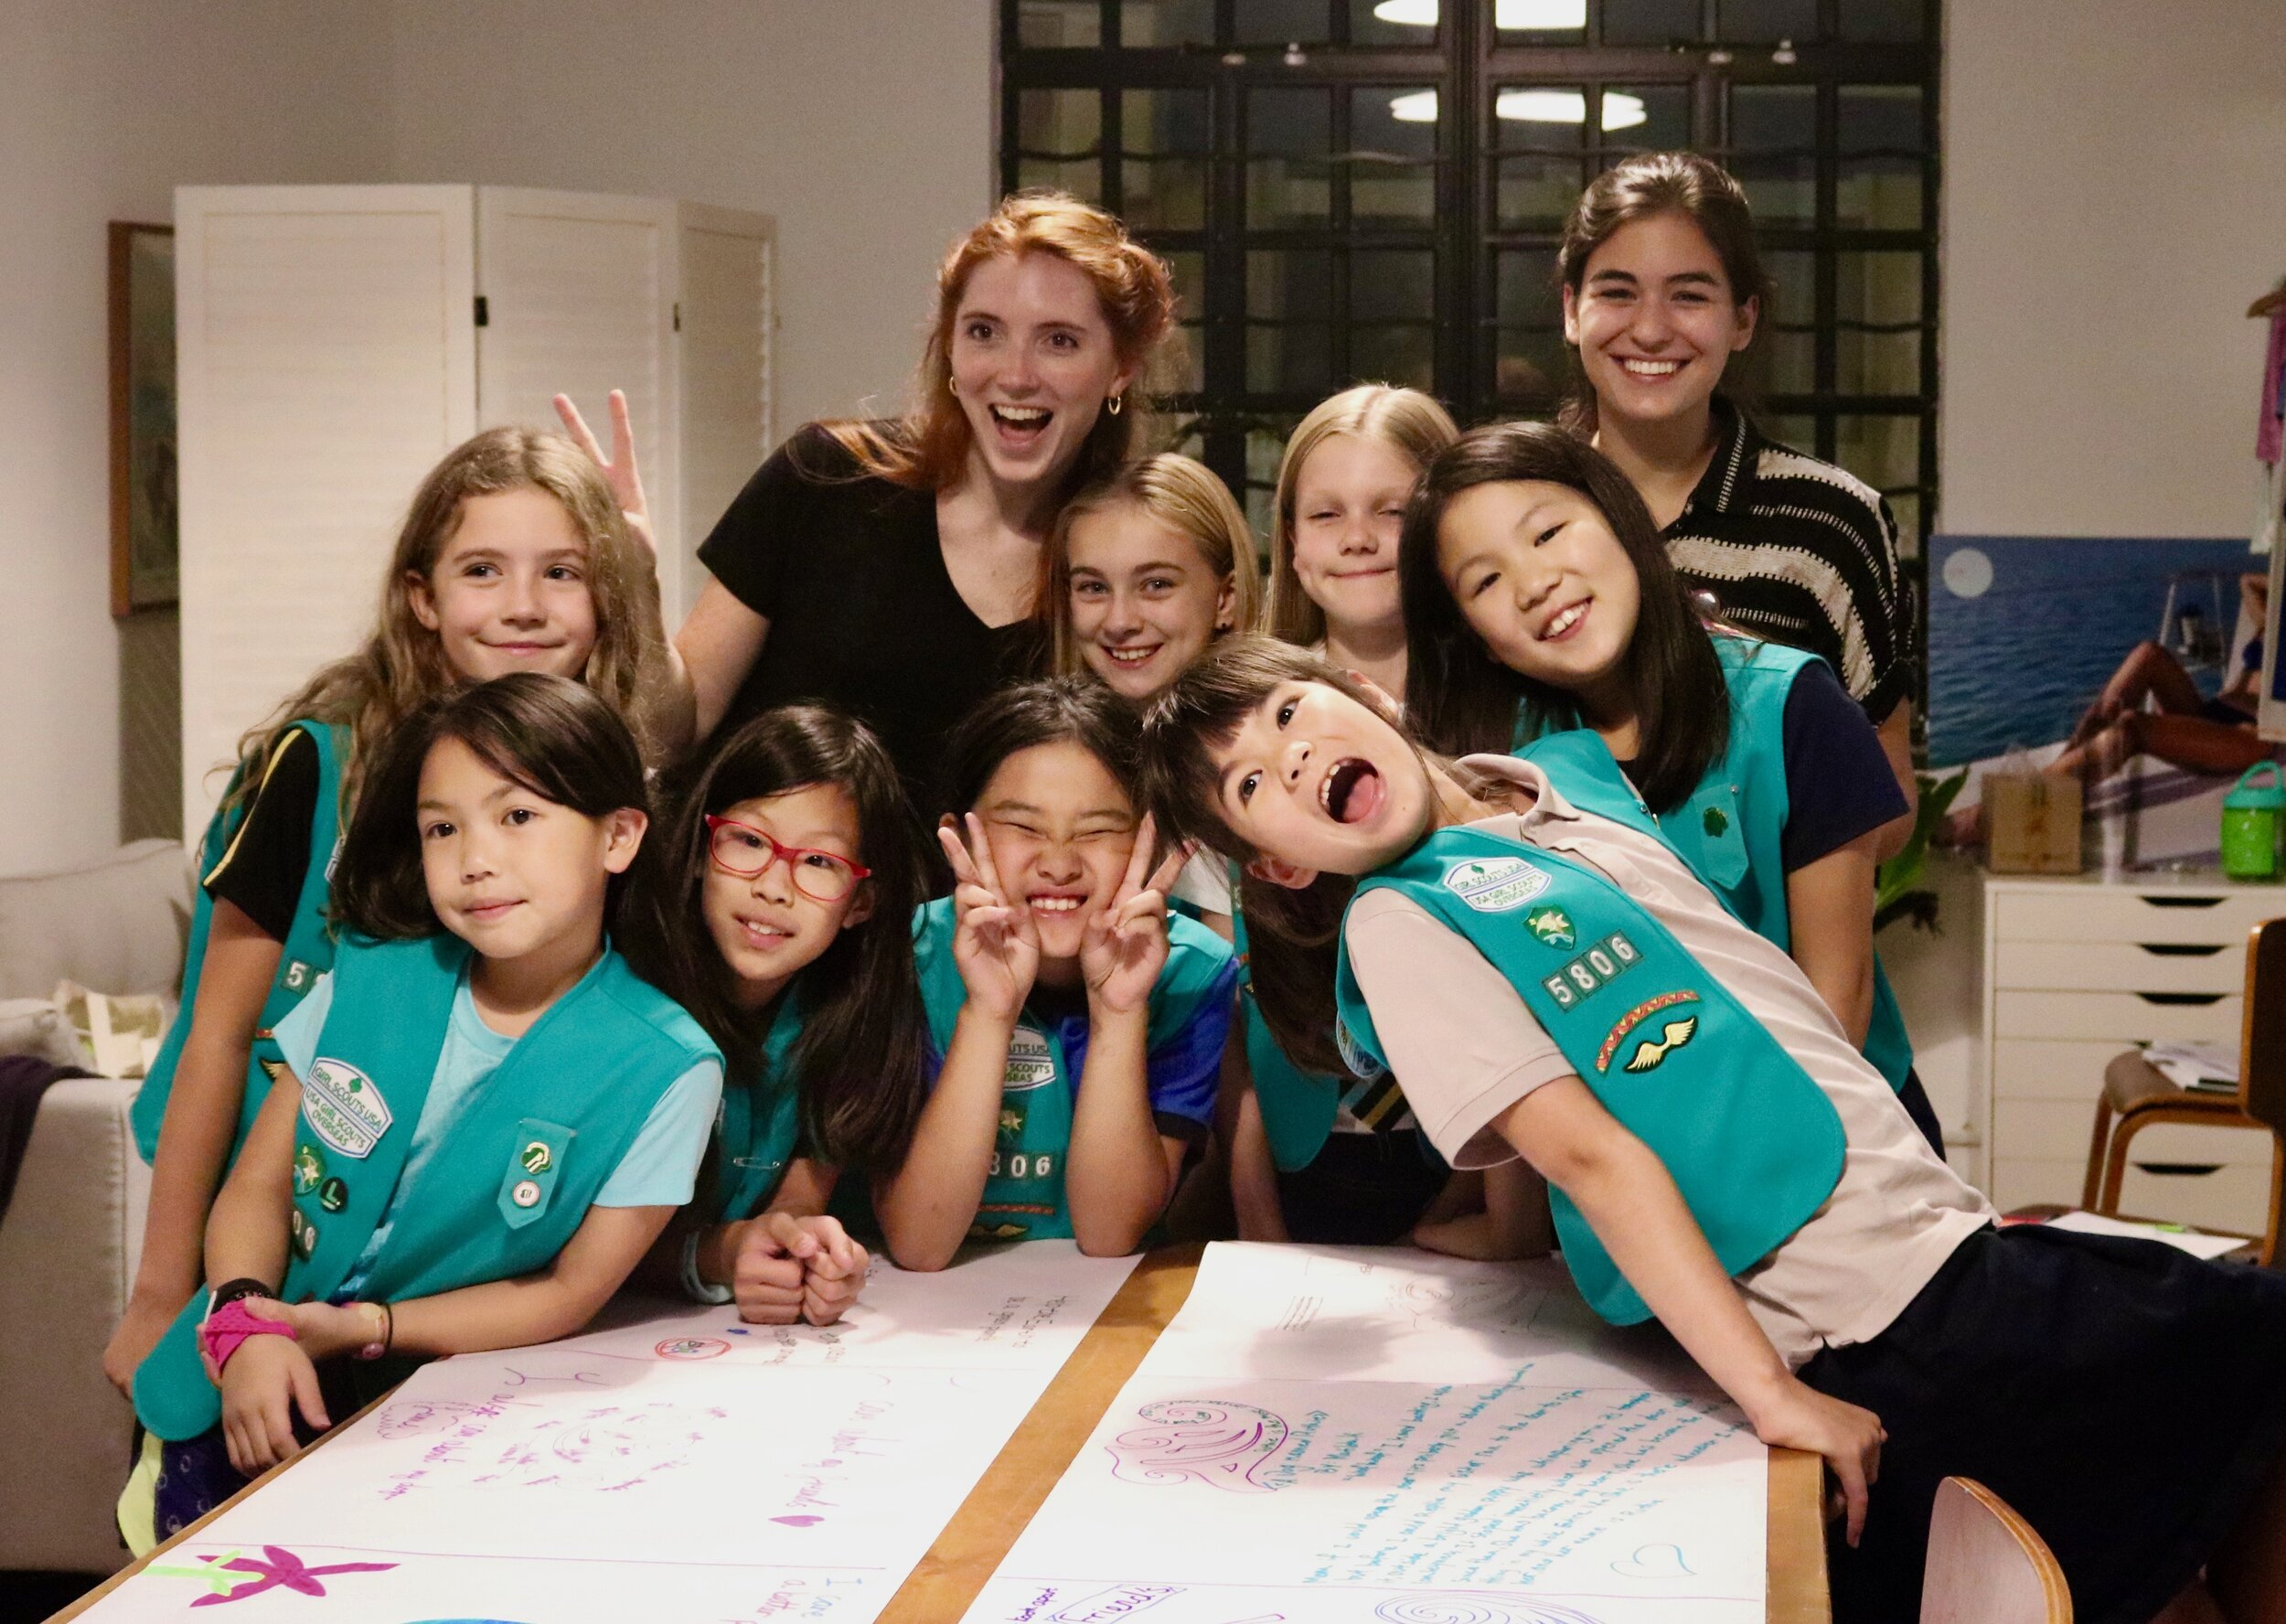 Unravel Impact Workshops - For Students, Grades K-12